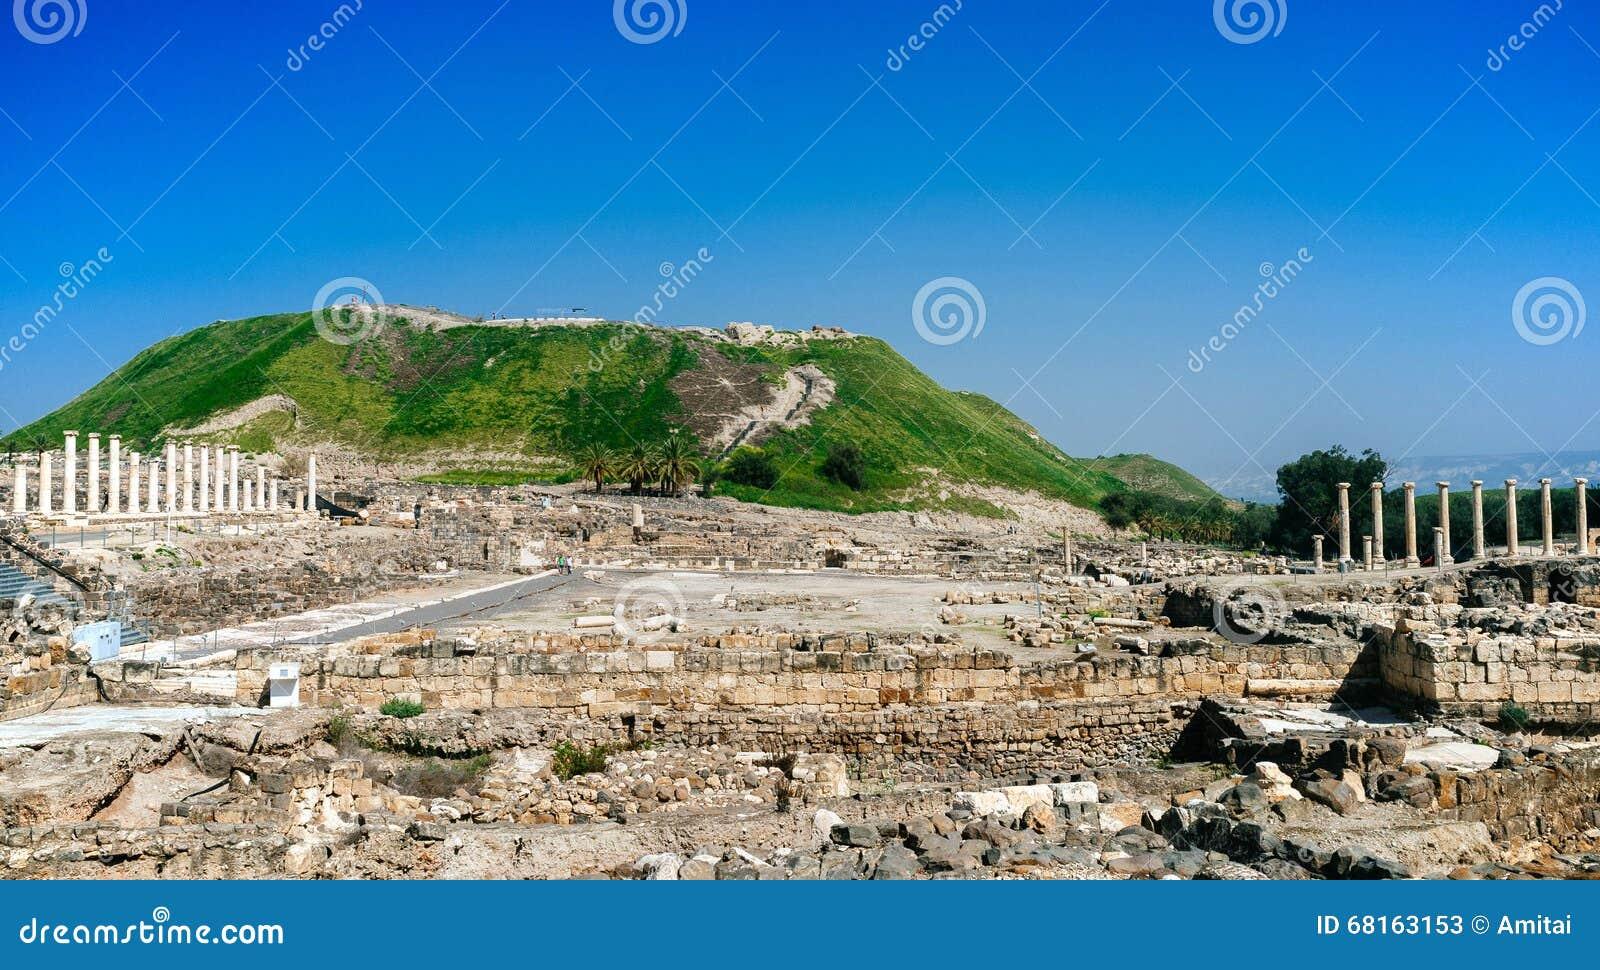 Serie della Terra Santa - Beit Shean ruins#4